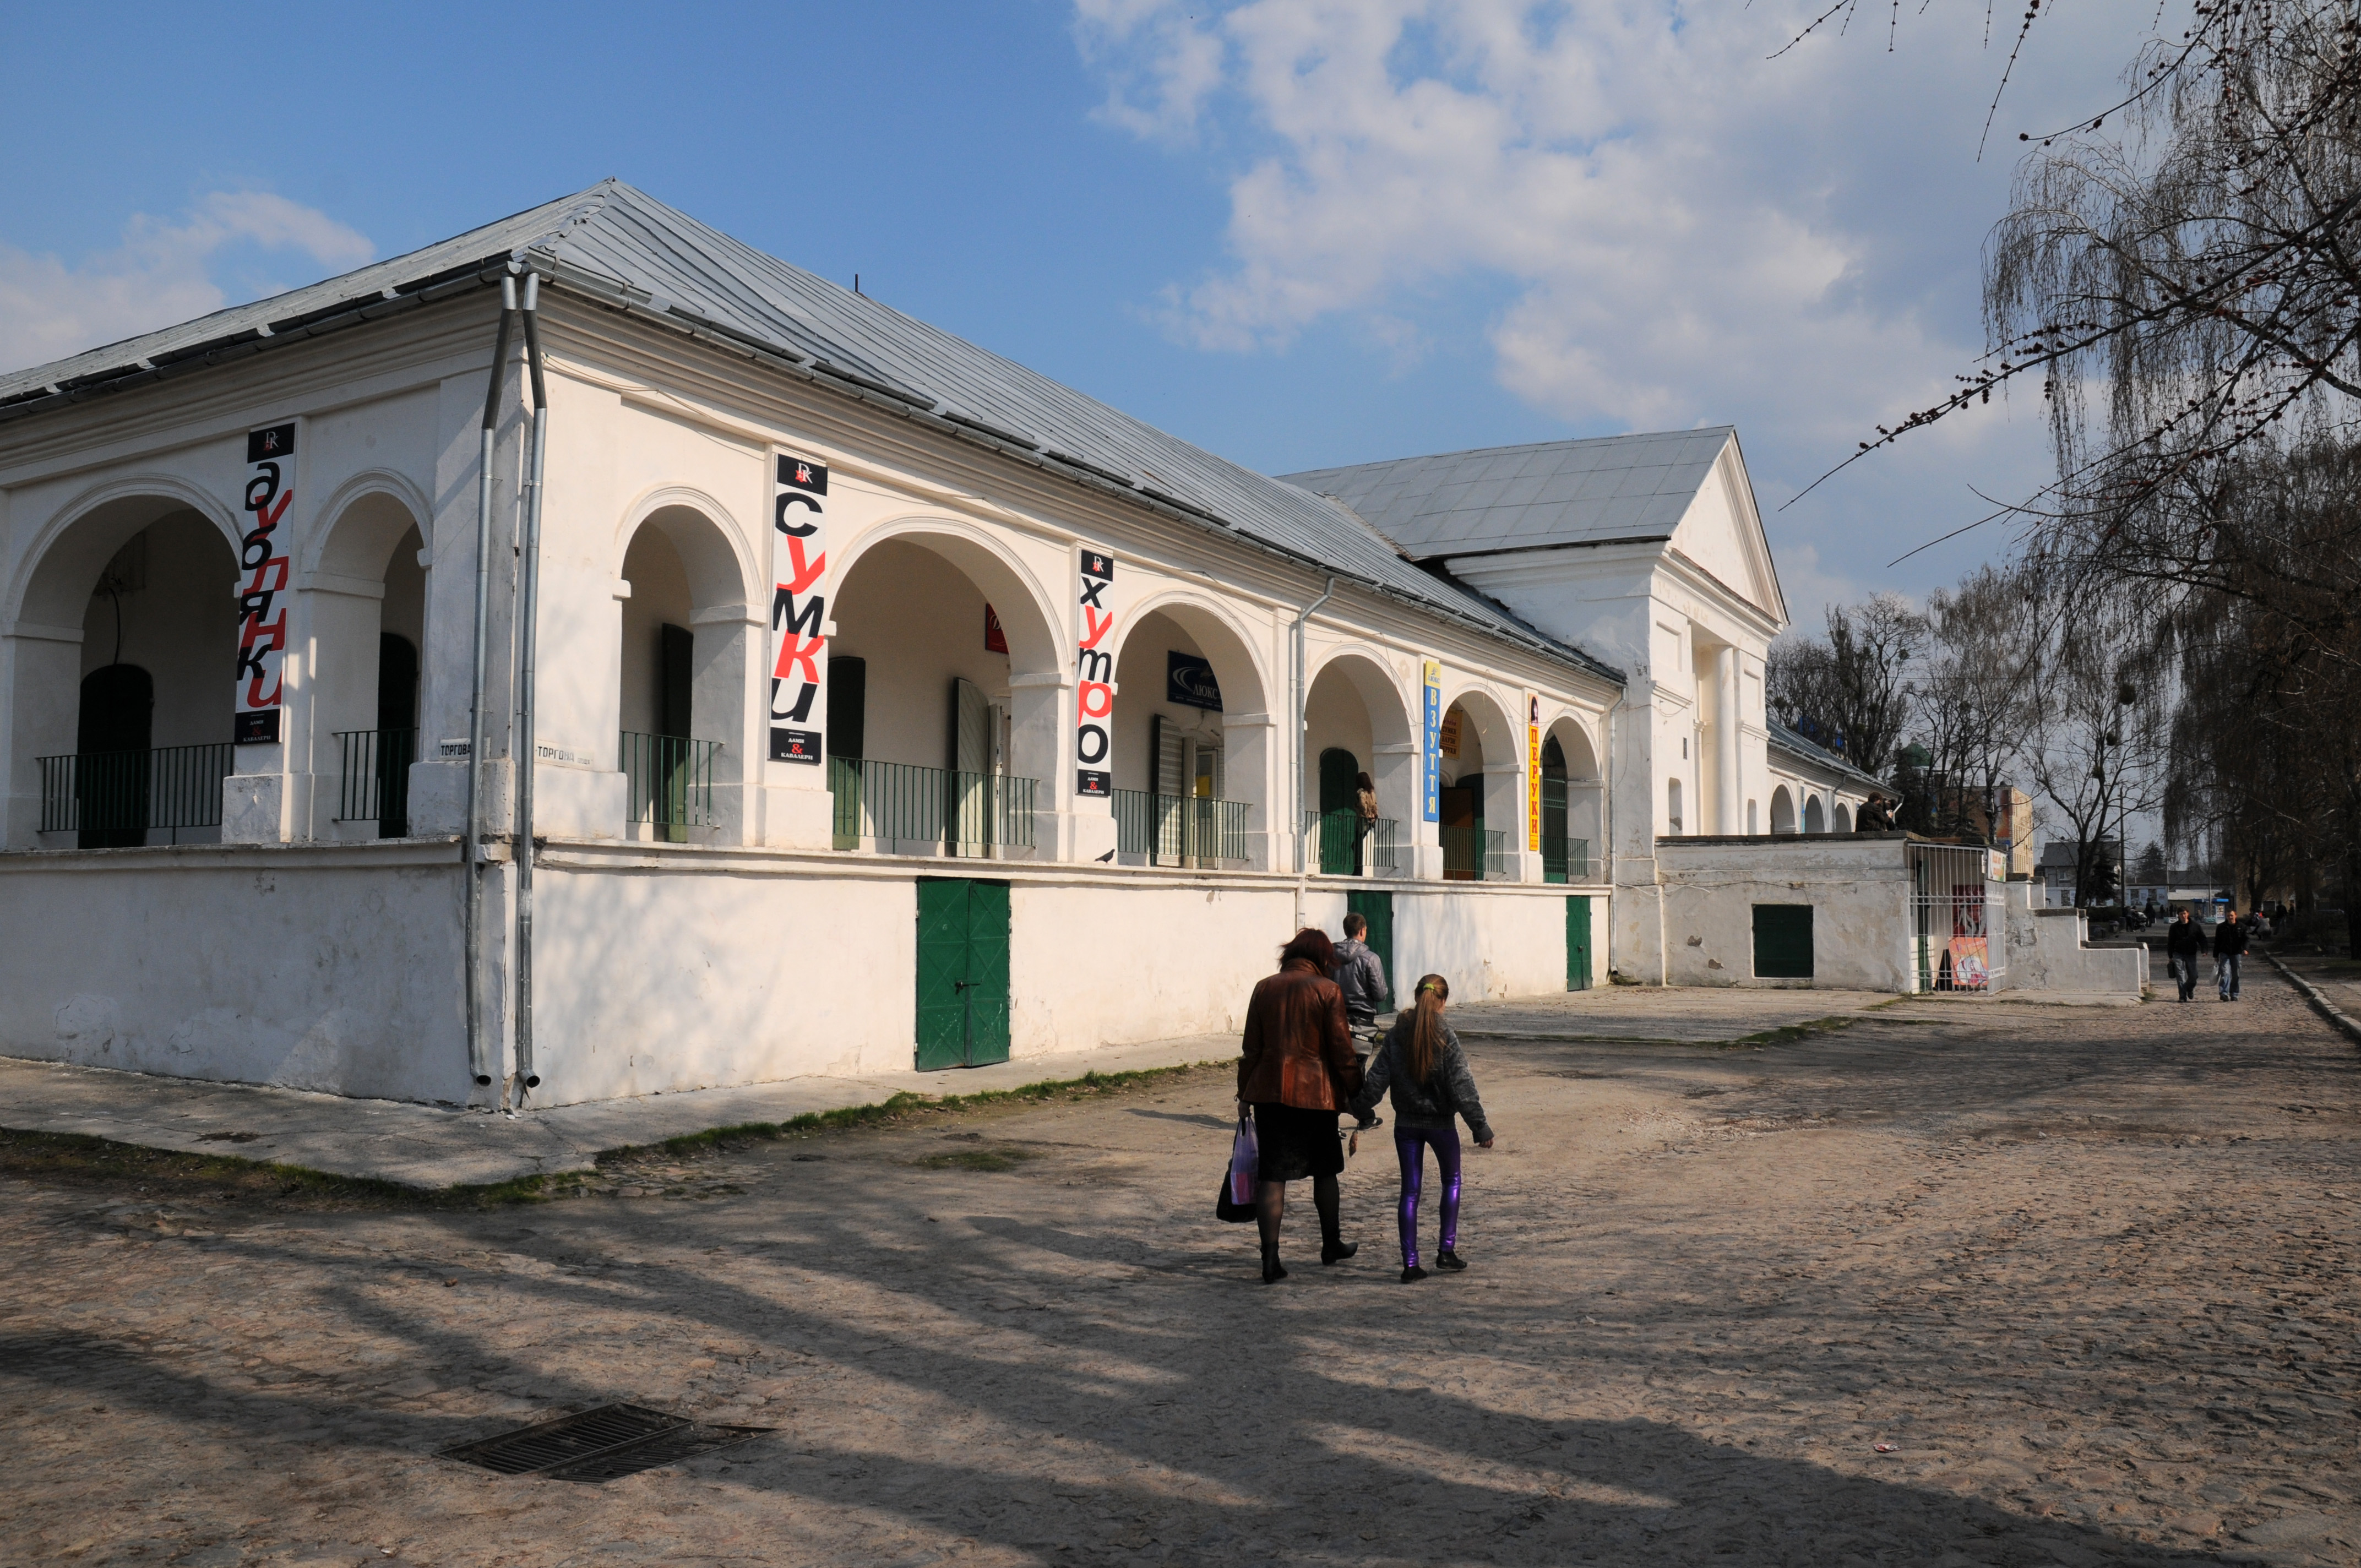 Bila Tserkva Ukraine  city photos : Bila Tserkva torgovi riady DSC 1052 32 103 0001 Wikimedia ...